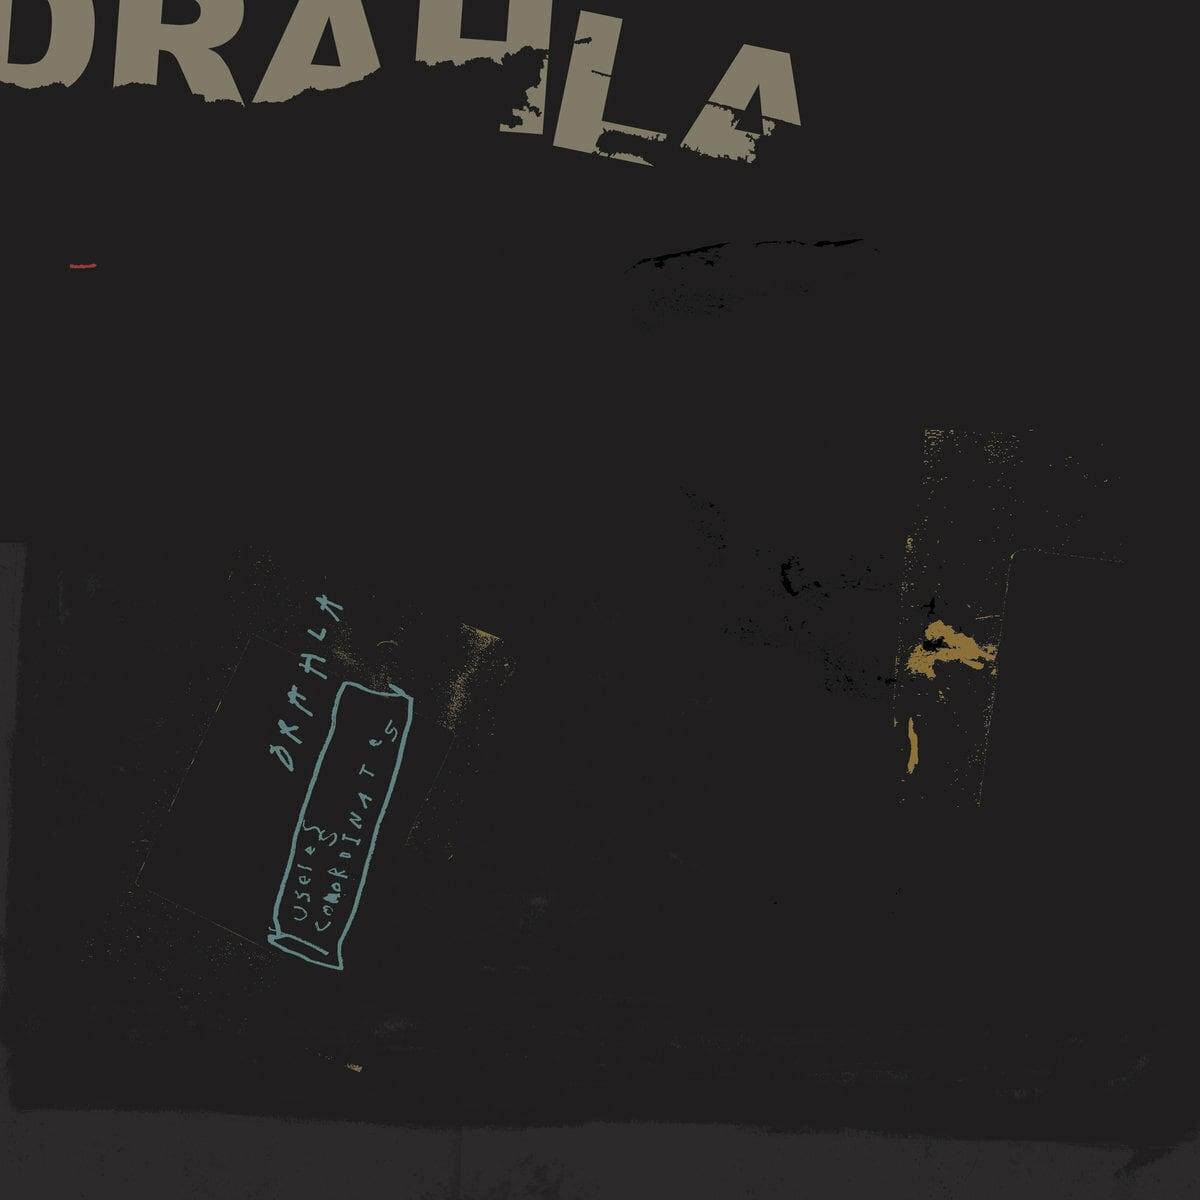 Drahla / Useless Coordinates(500 Ltd Special Edition LP)